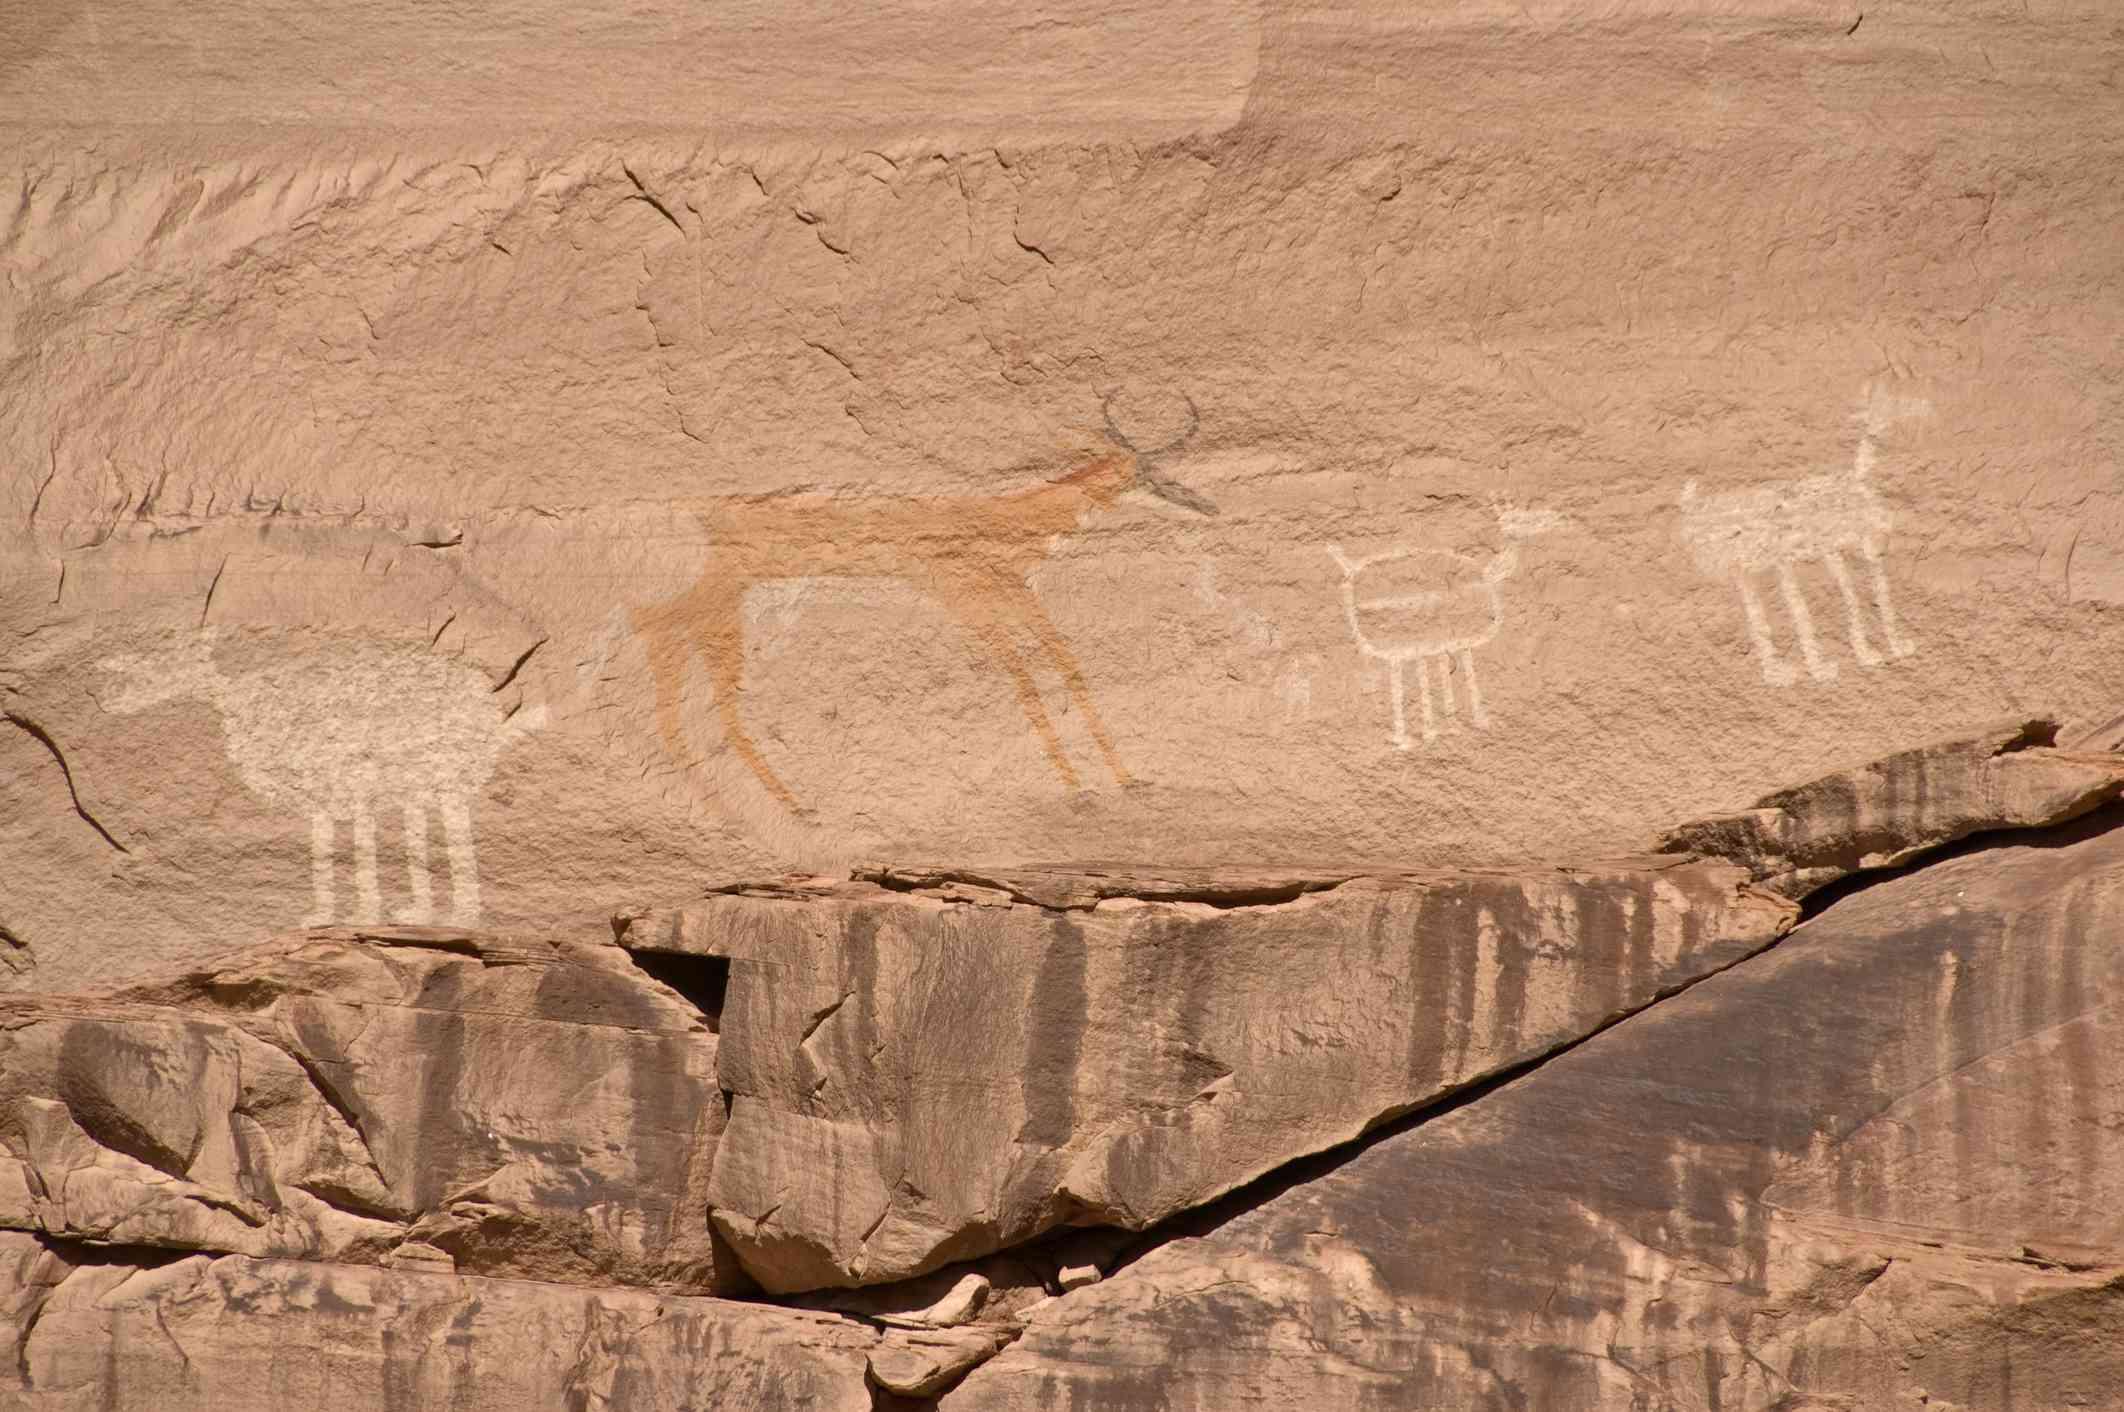 Canyon del Muerto pictographs